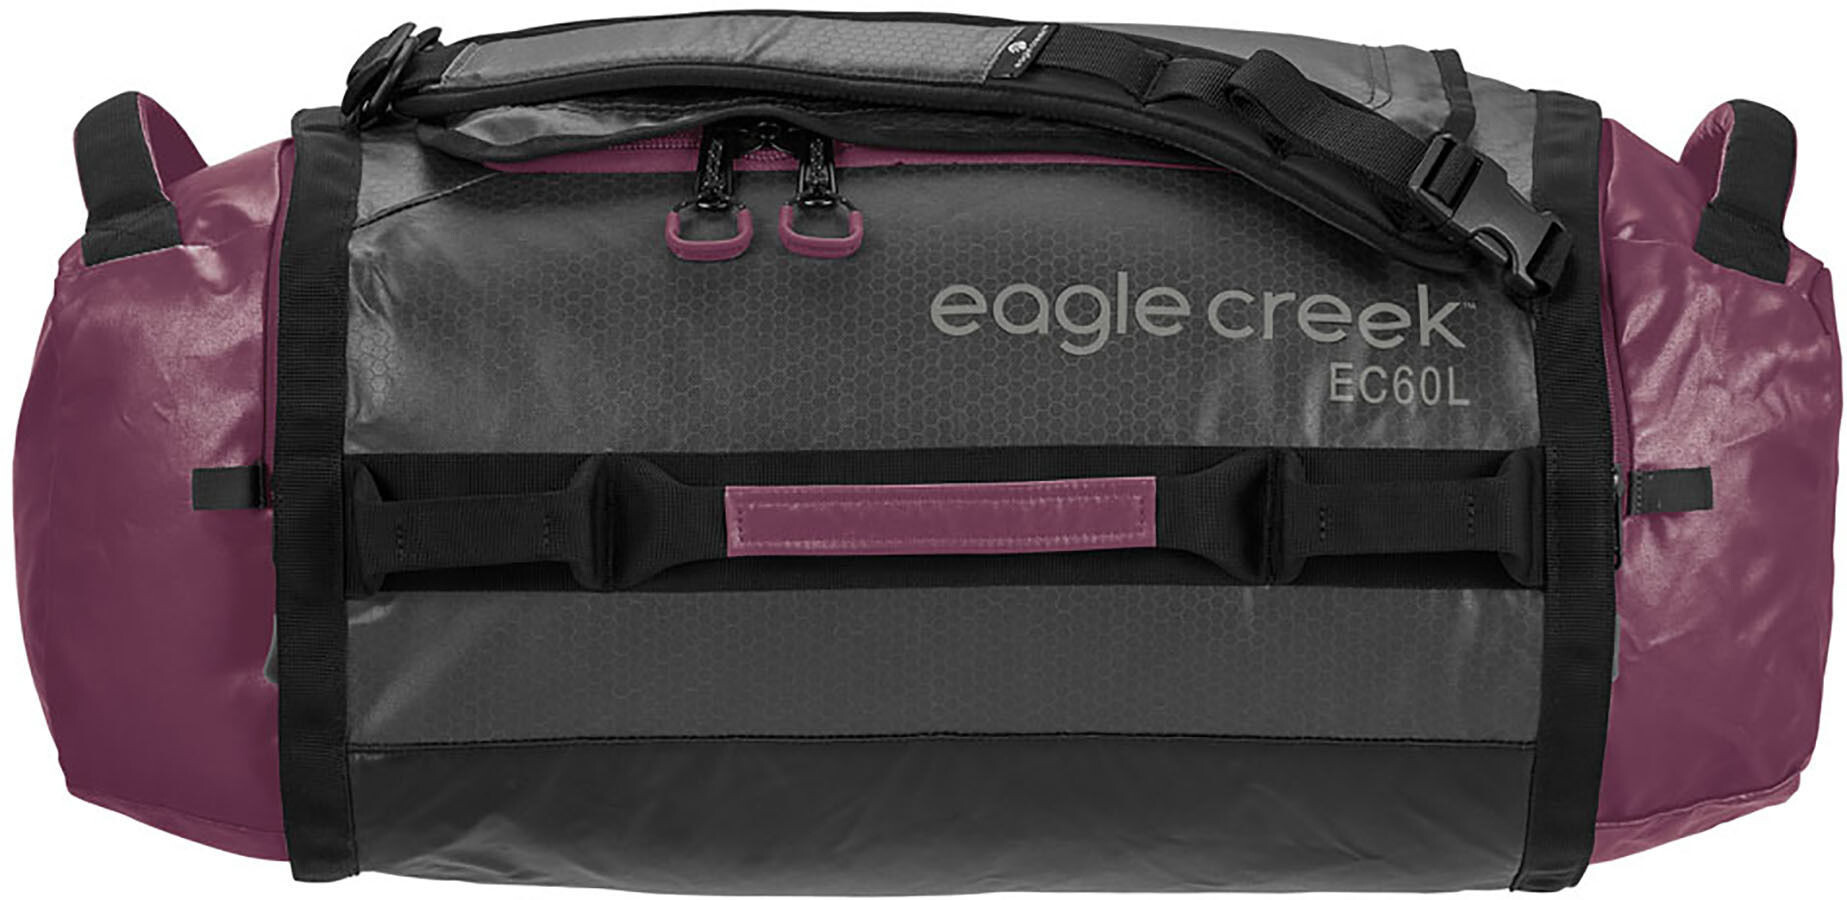 Eagle Creek Cargo Hauler Hauler Hauler Duffel 60l concord/asphalt 199d1b